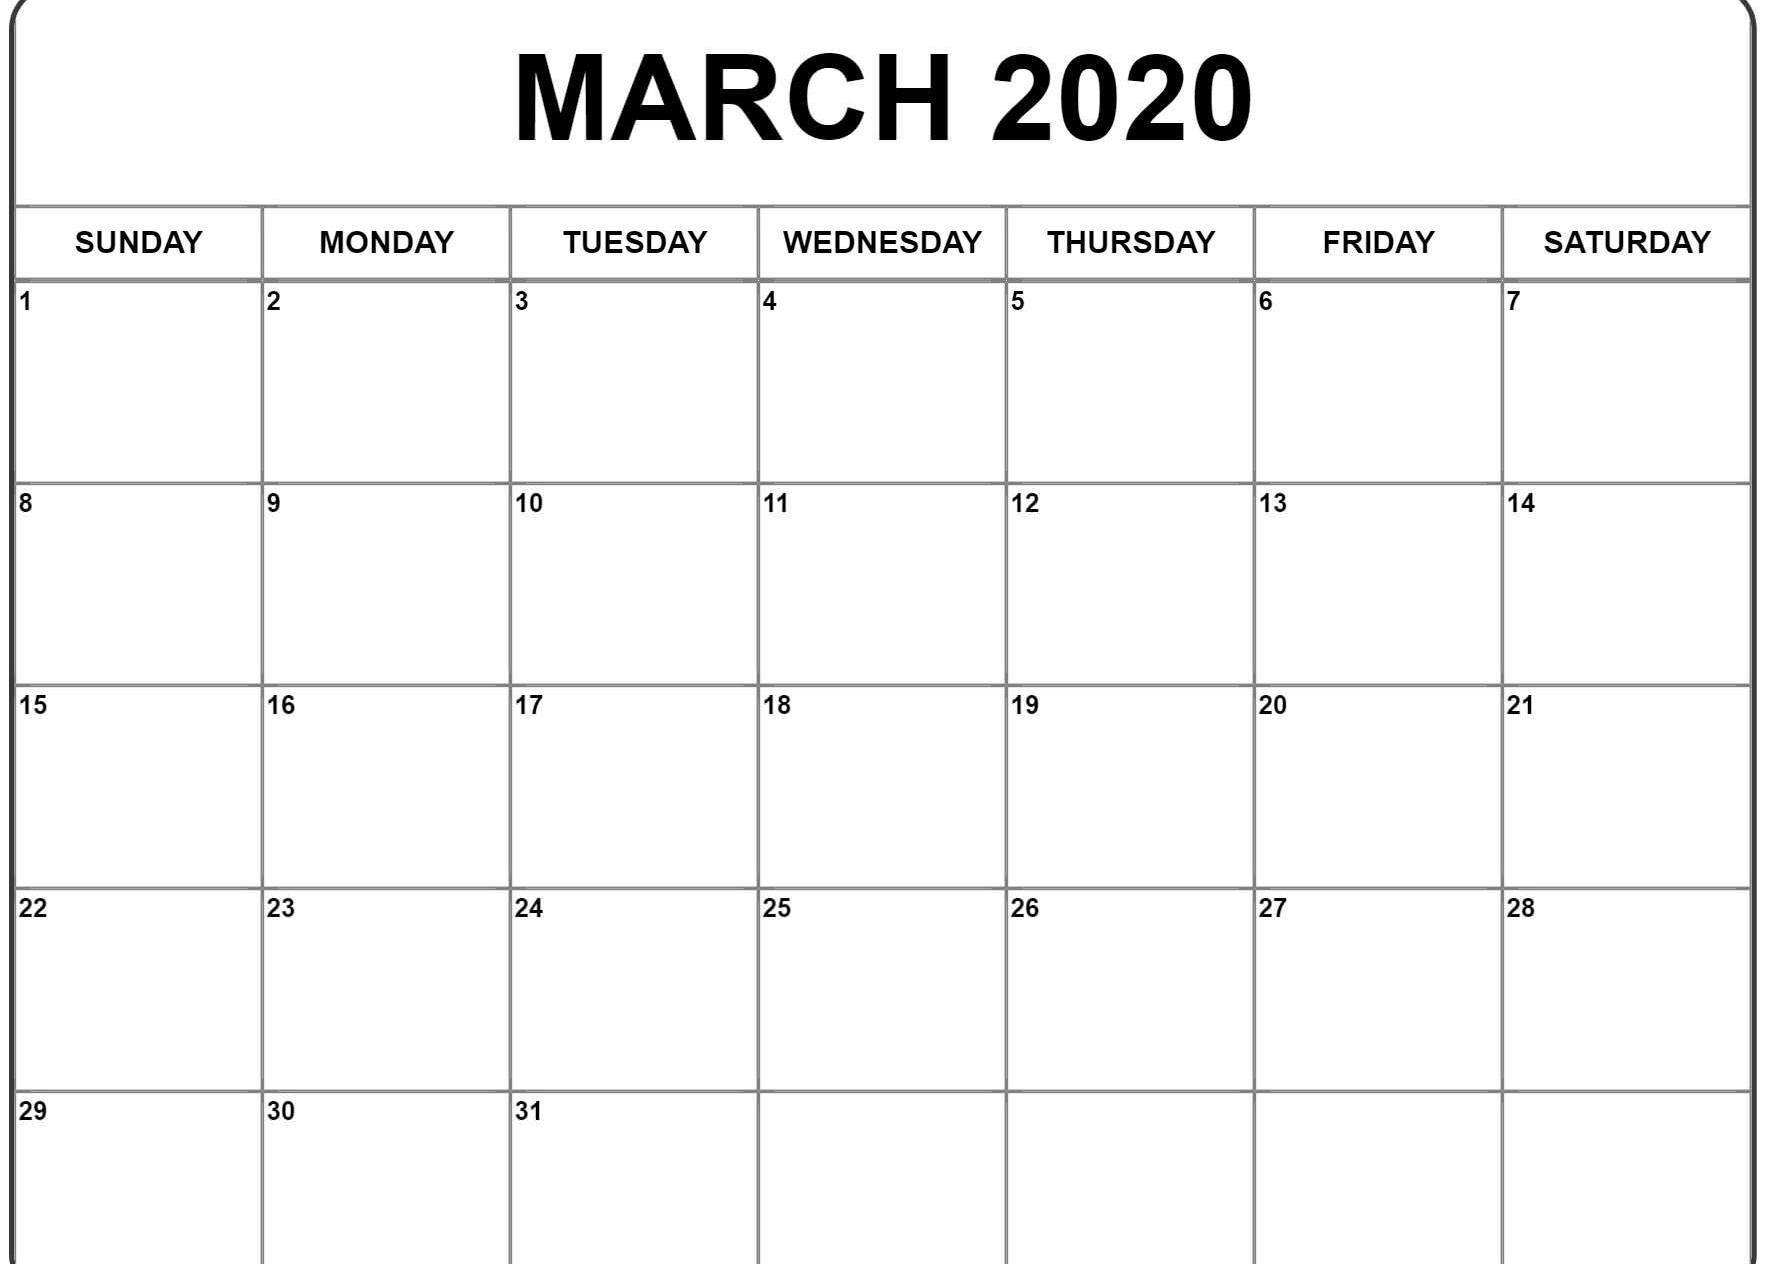 March 2020 Blank Calendar Printable In 2020 Calendar